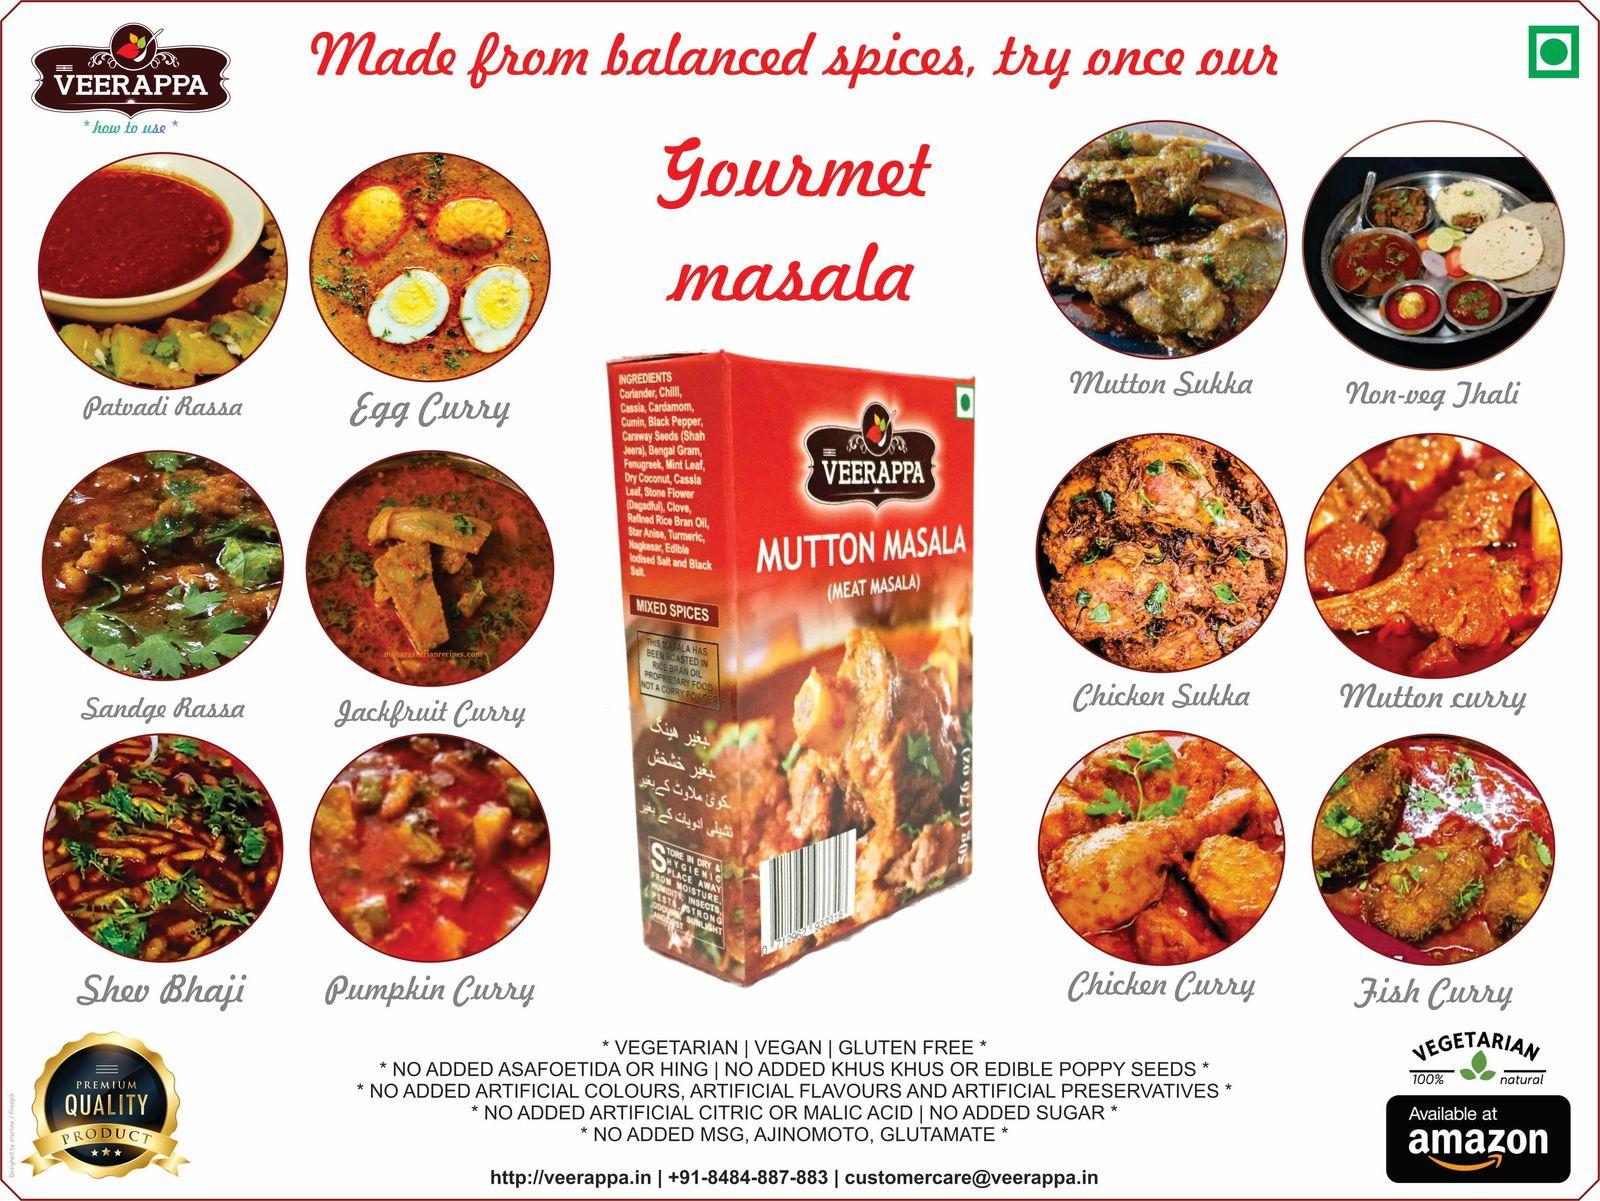 VEERAPPA Mutton (Meat) Masala 200g